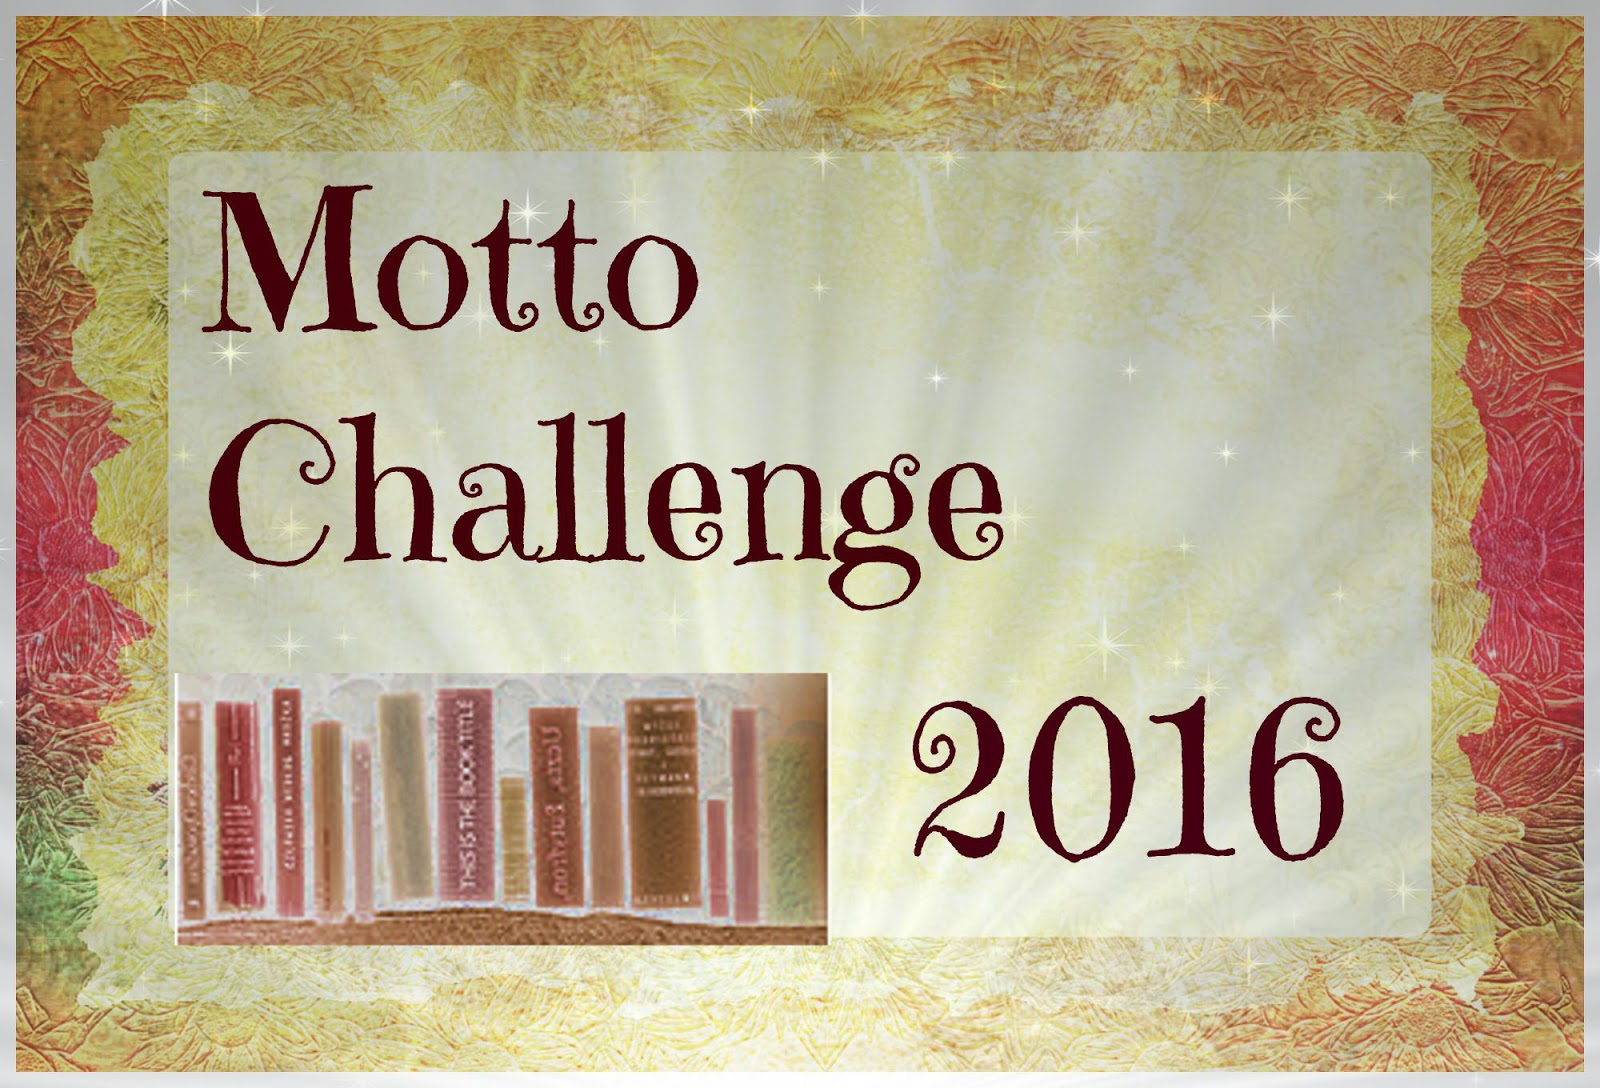 http://sunnyslesewelt.blogspot.de/2015/12/challenge-motto-challenge-2016-bei.html